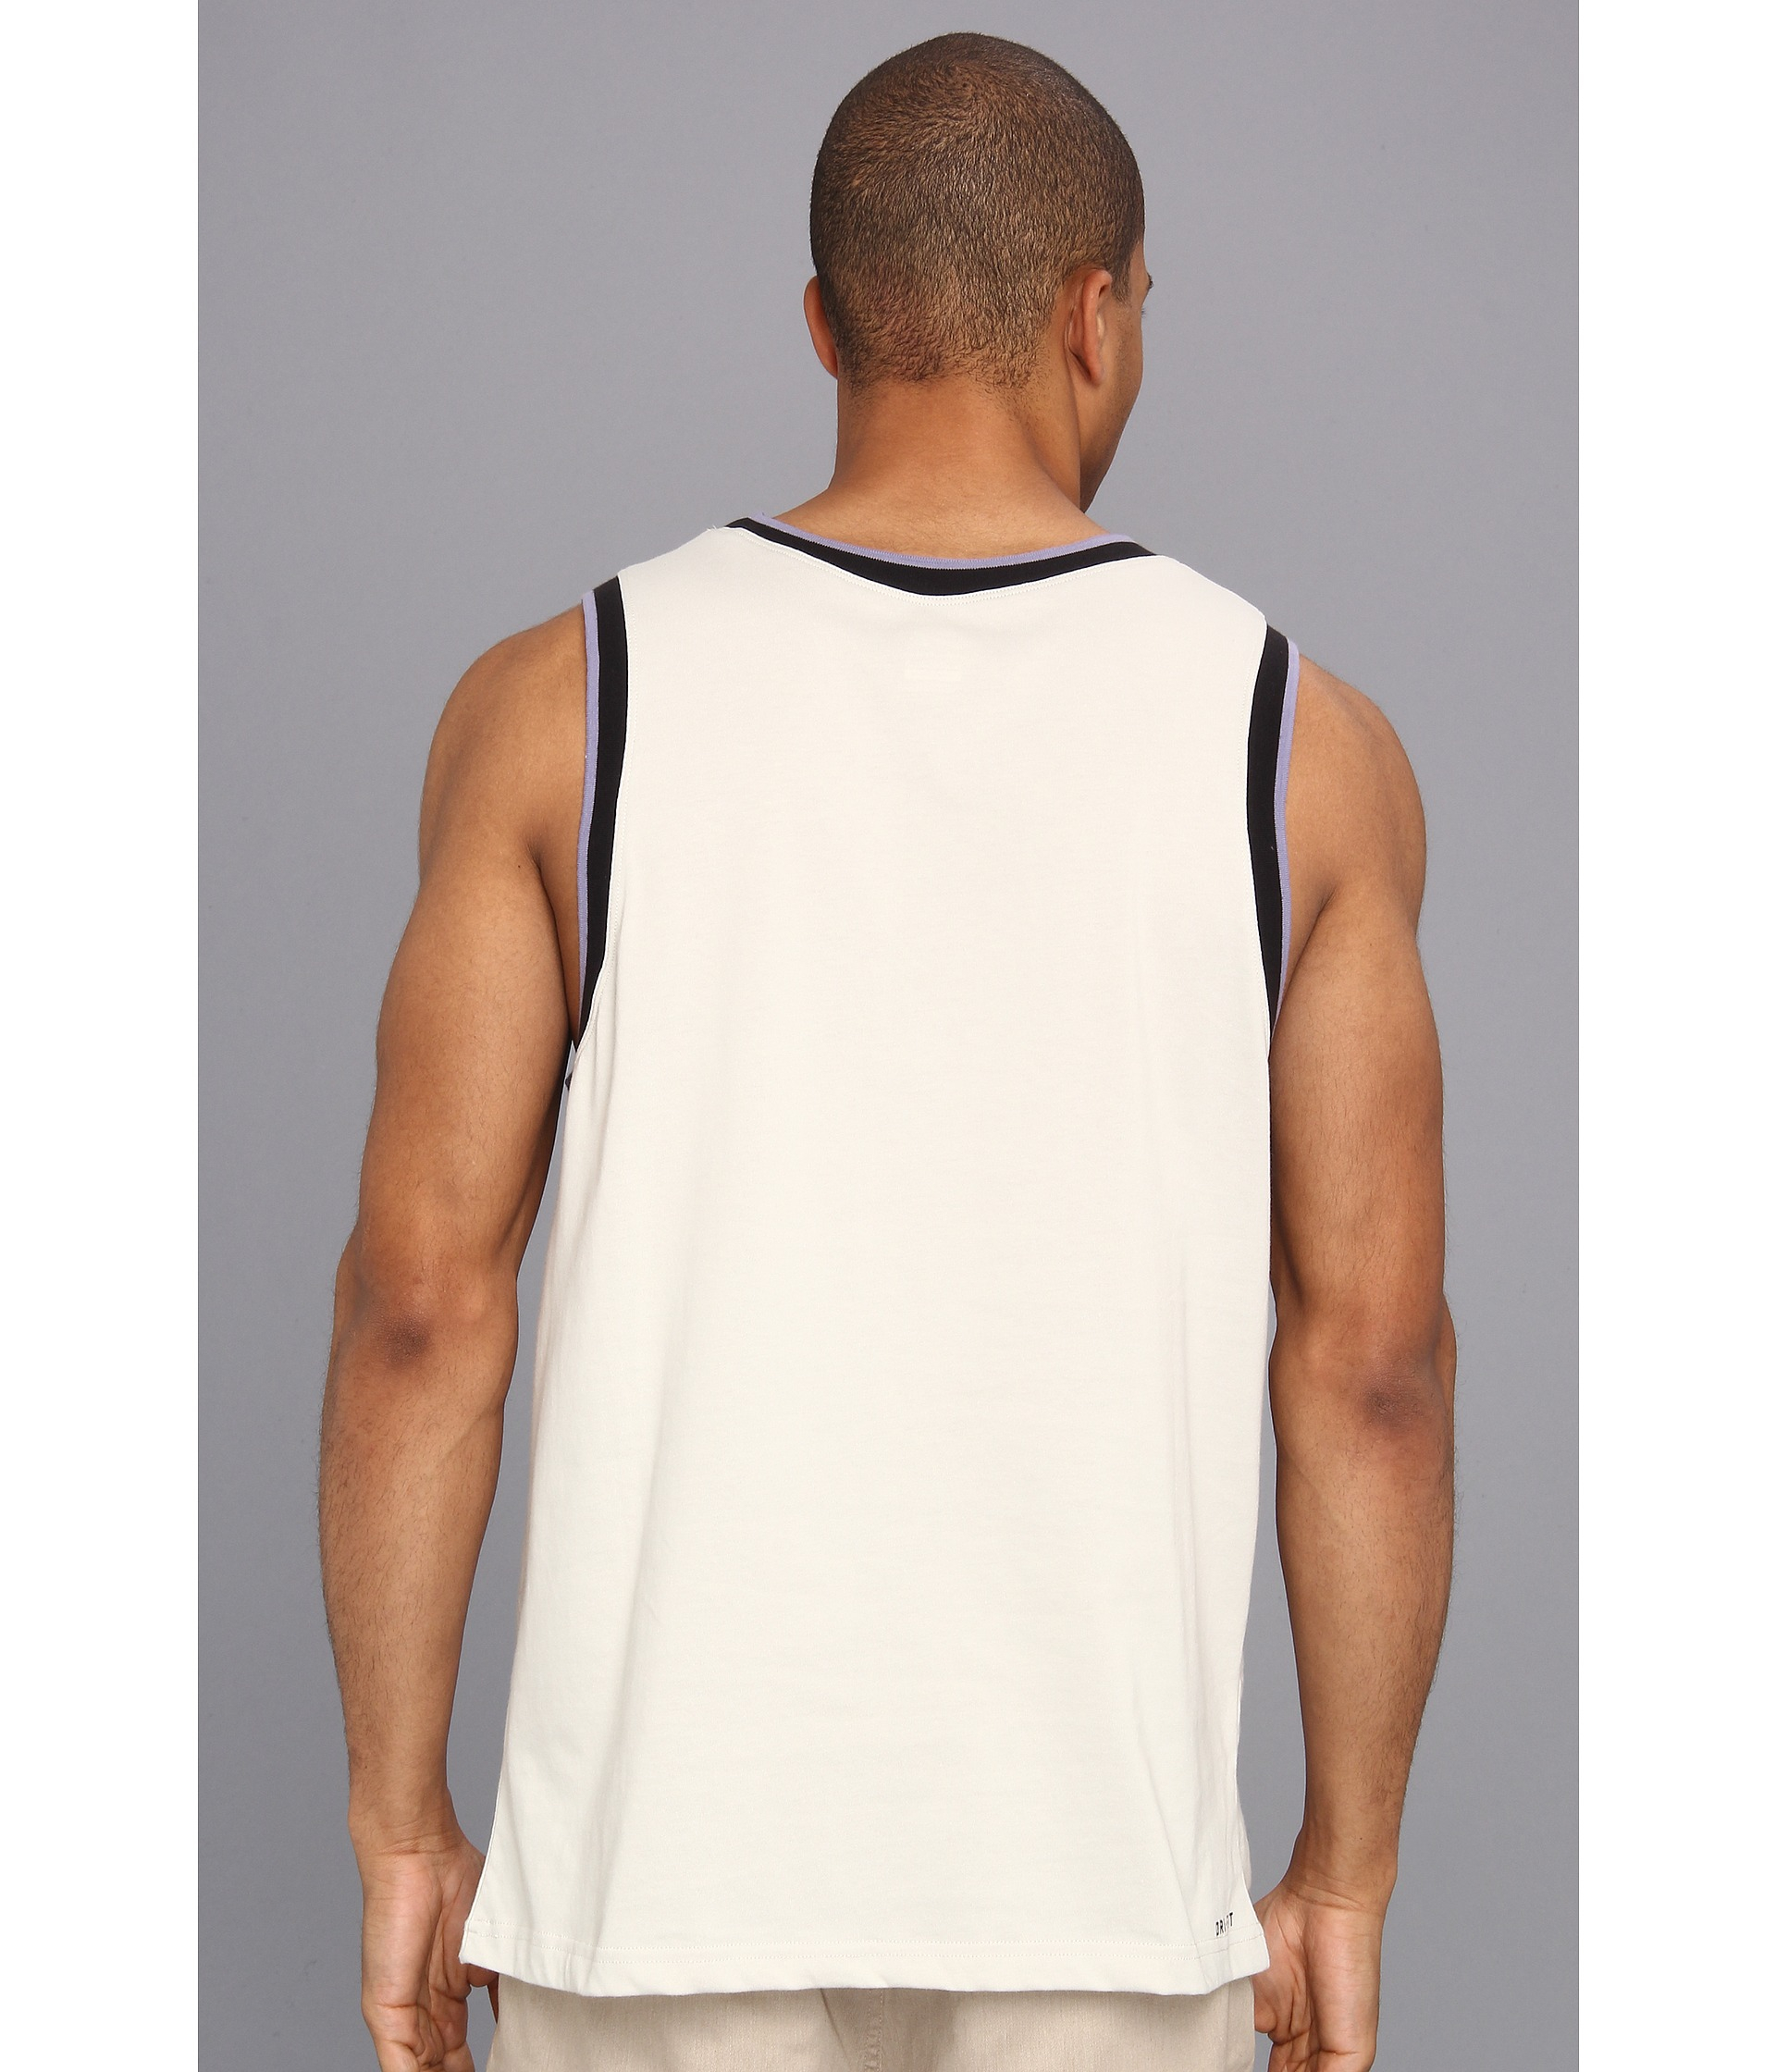 56704b231f9888 Lyst - Nike Sb Varsity Drifit Tank Top in White for Men